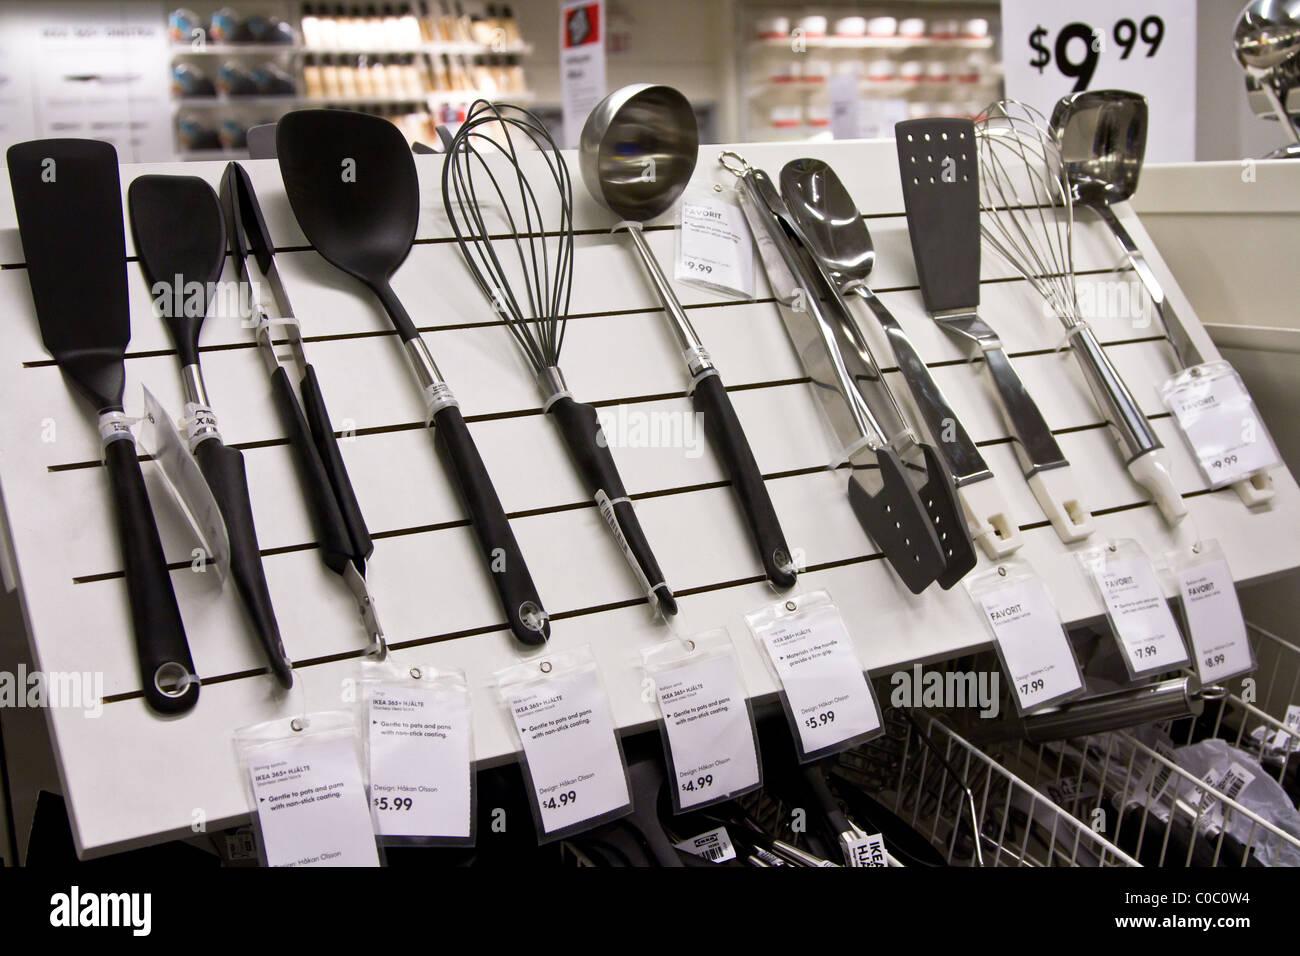 kitchen utensil store display Stock Photo: 34684864 - Alamy